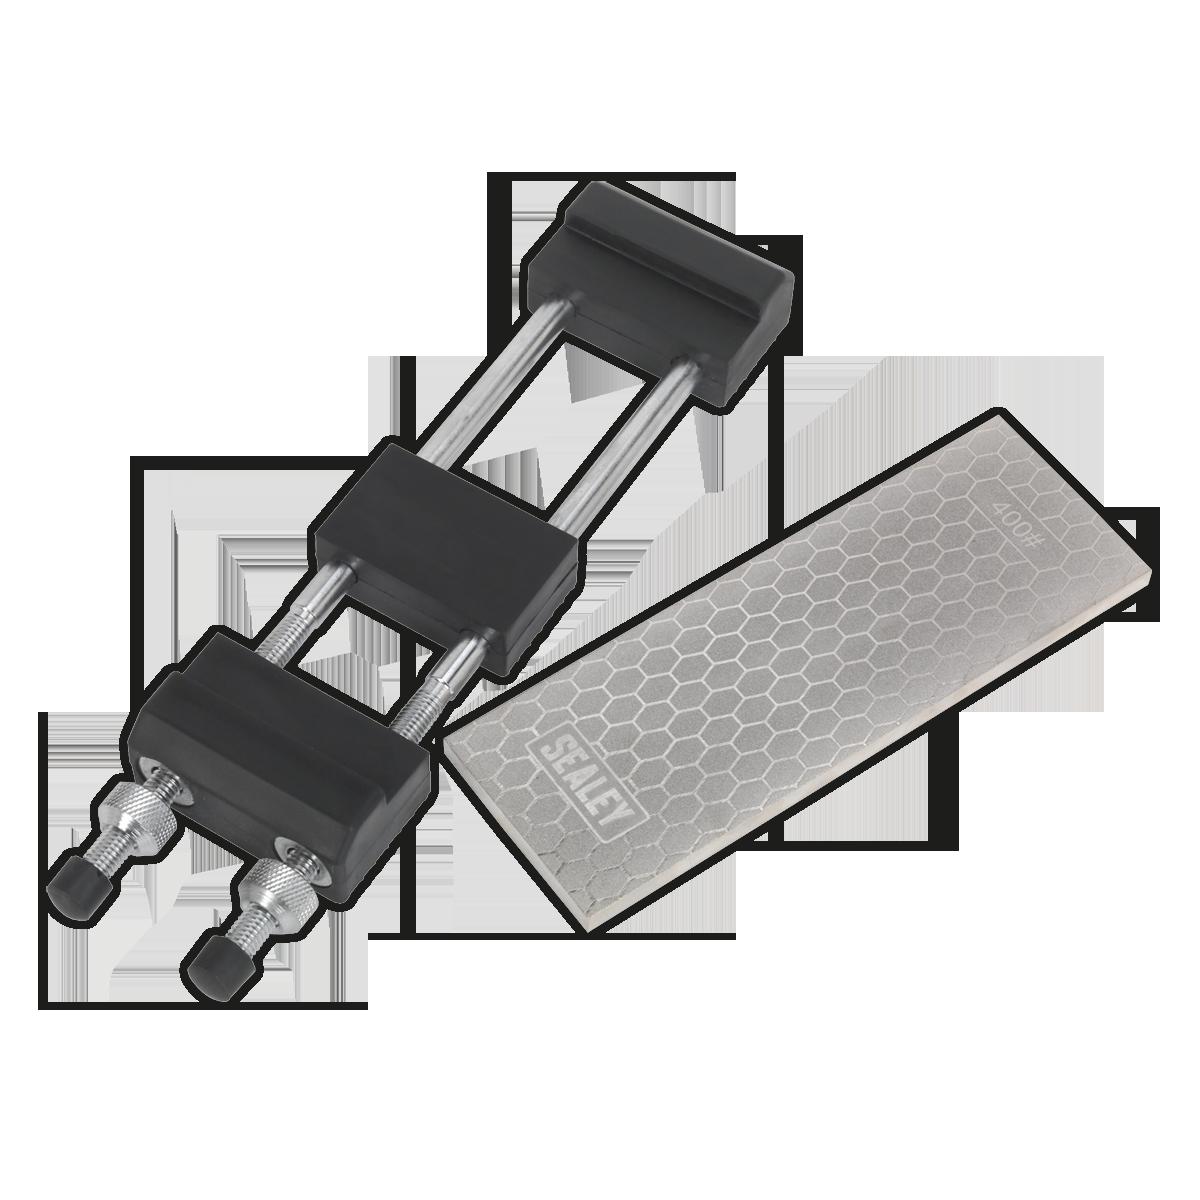 Combination Diamond Sharpening Whetstone with Adjustable Stone Holder